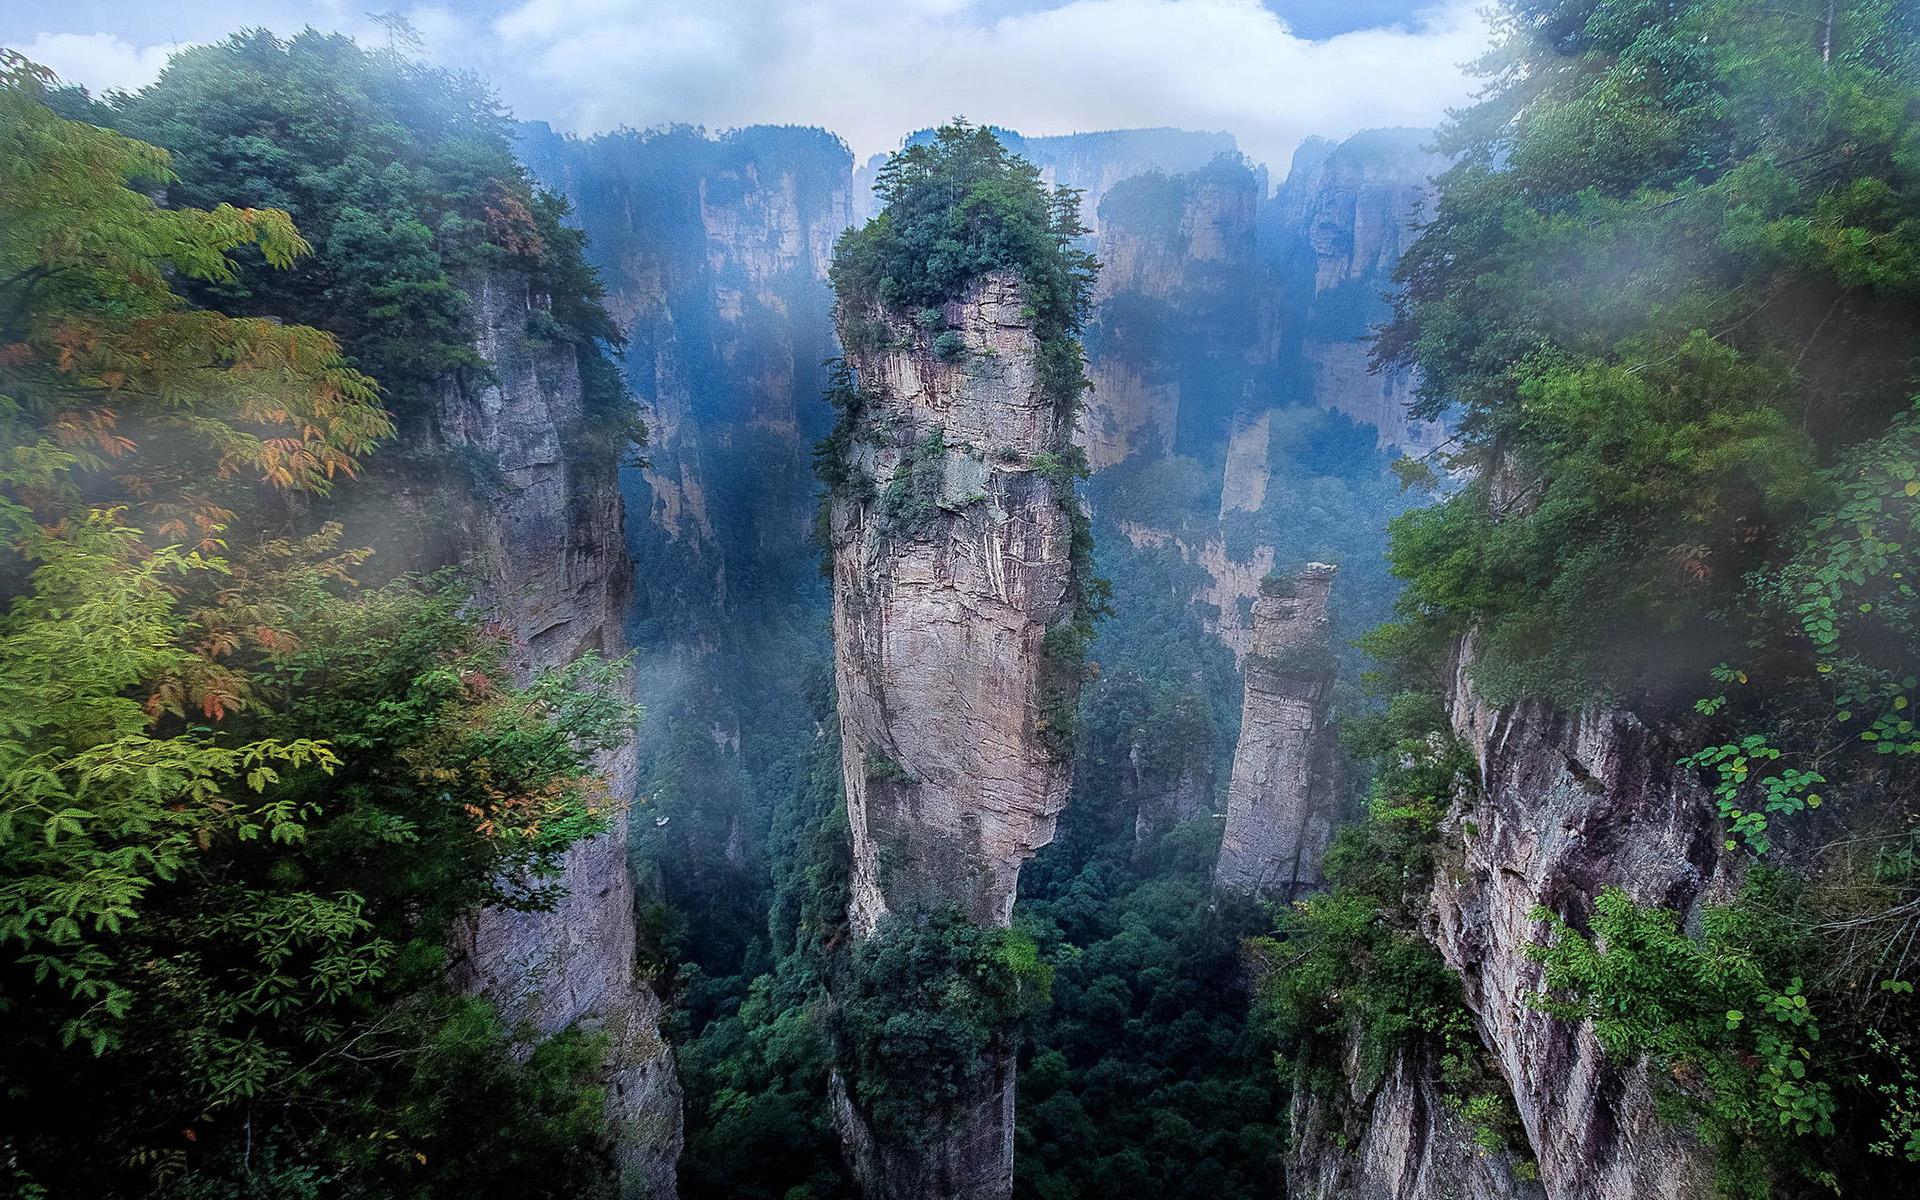 zhangjiajie national park in china hd wallpaper | background image